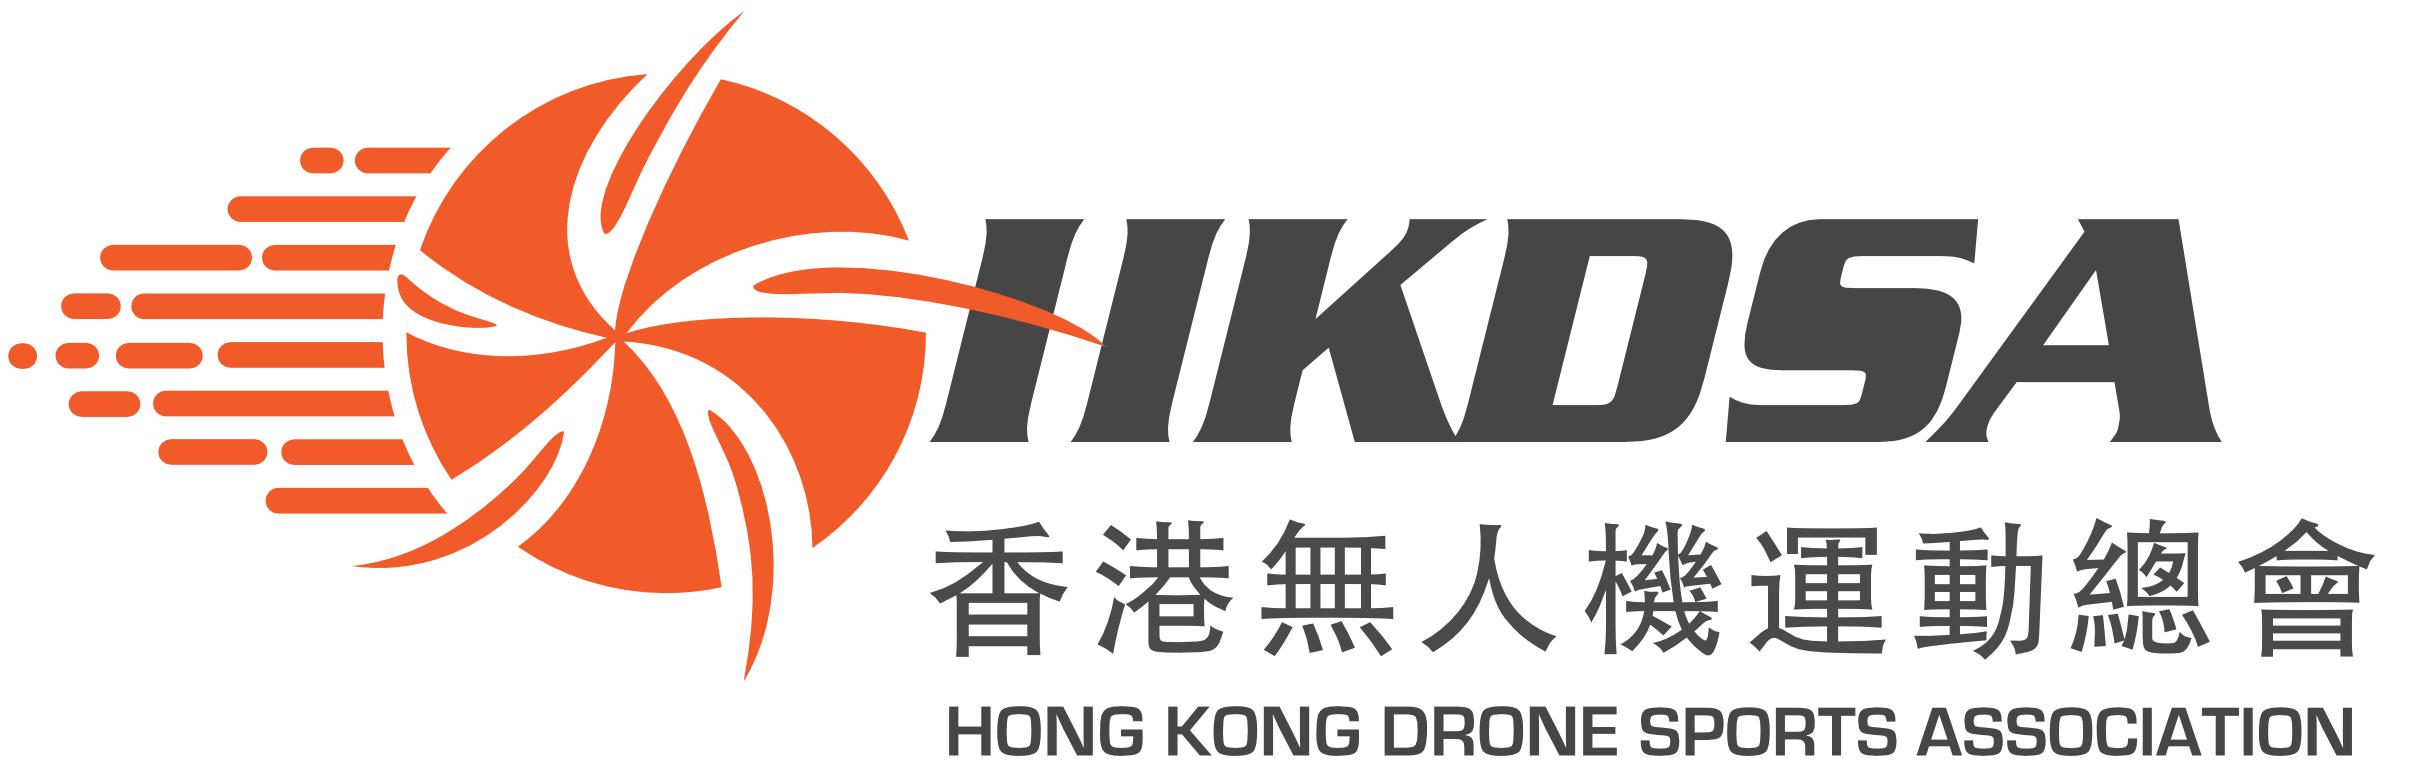 Hong Kong Drone Sports Association